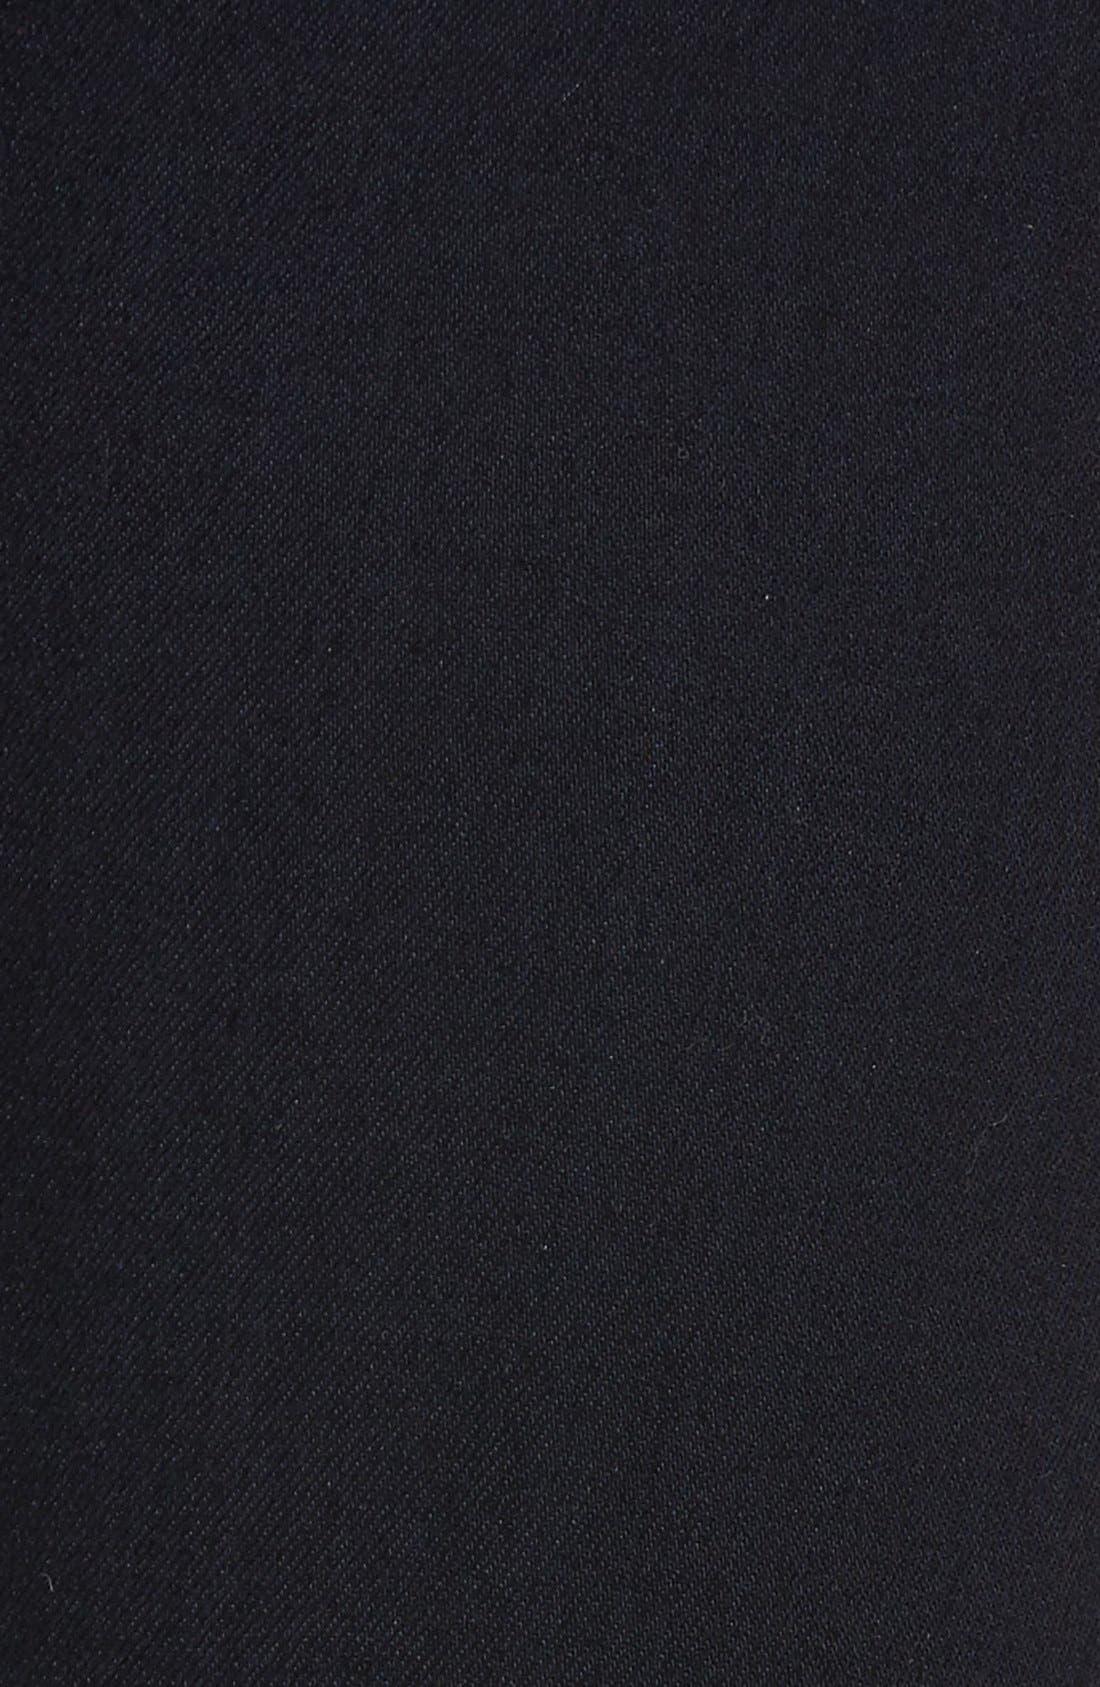 Alternate Image 5  - 7 For All Mankind b(air) High Waist Skinny Jeans (Blue/Black River Thames)